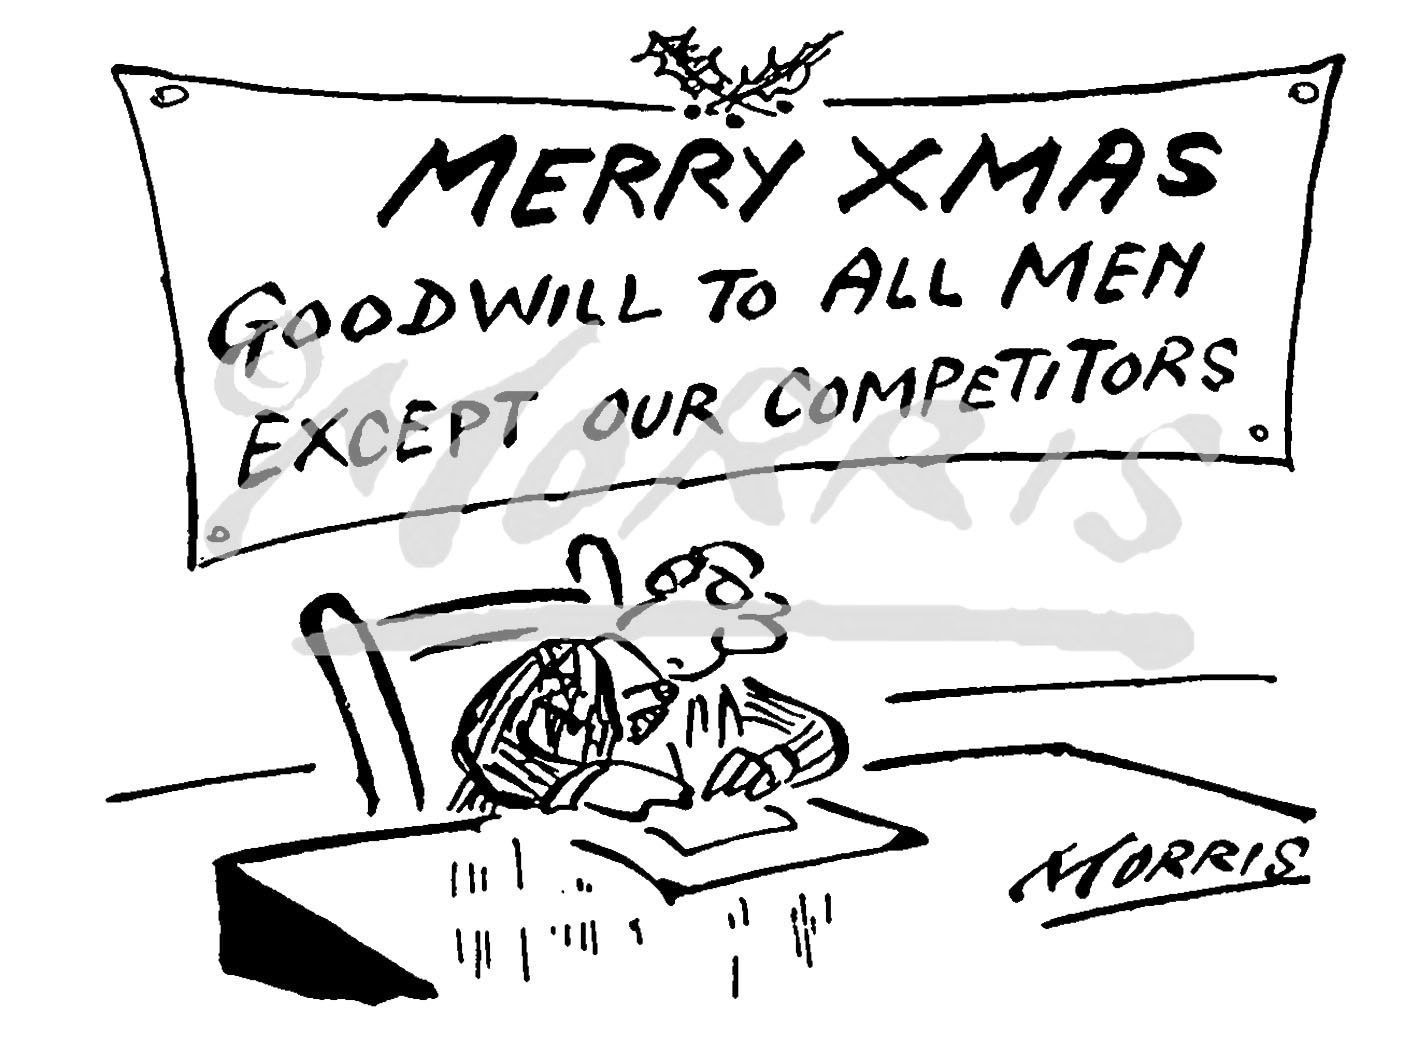 Business Christmas cartoon Ref: 0965bw